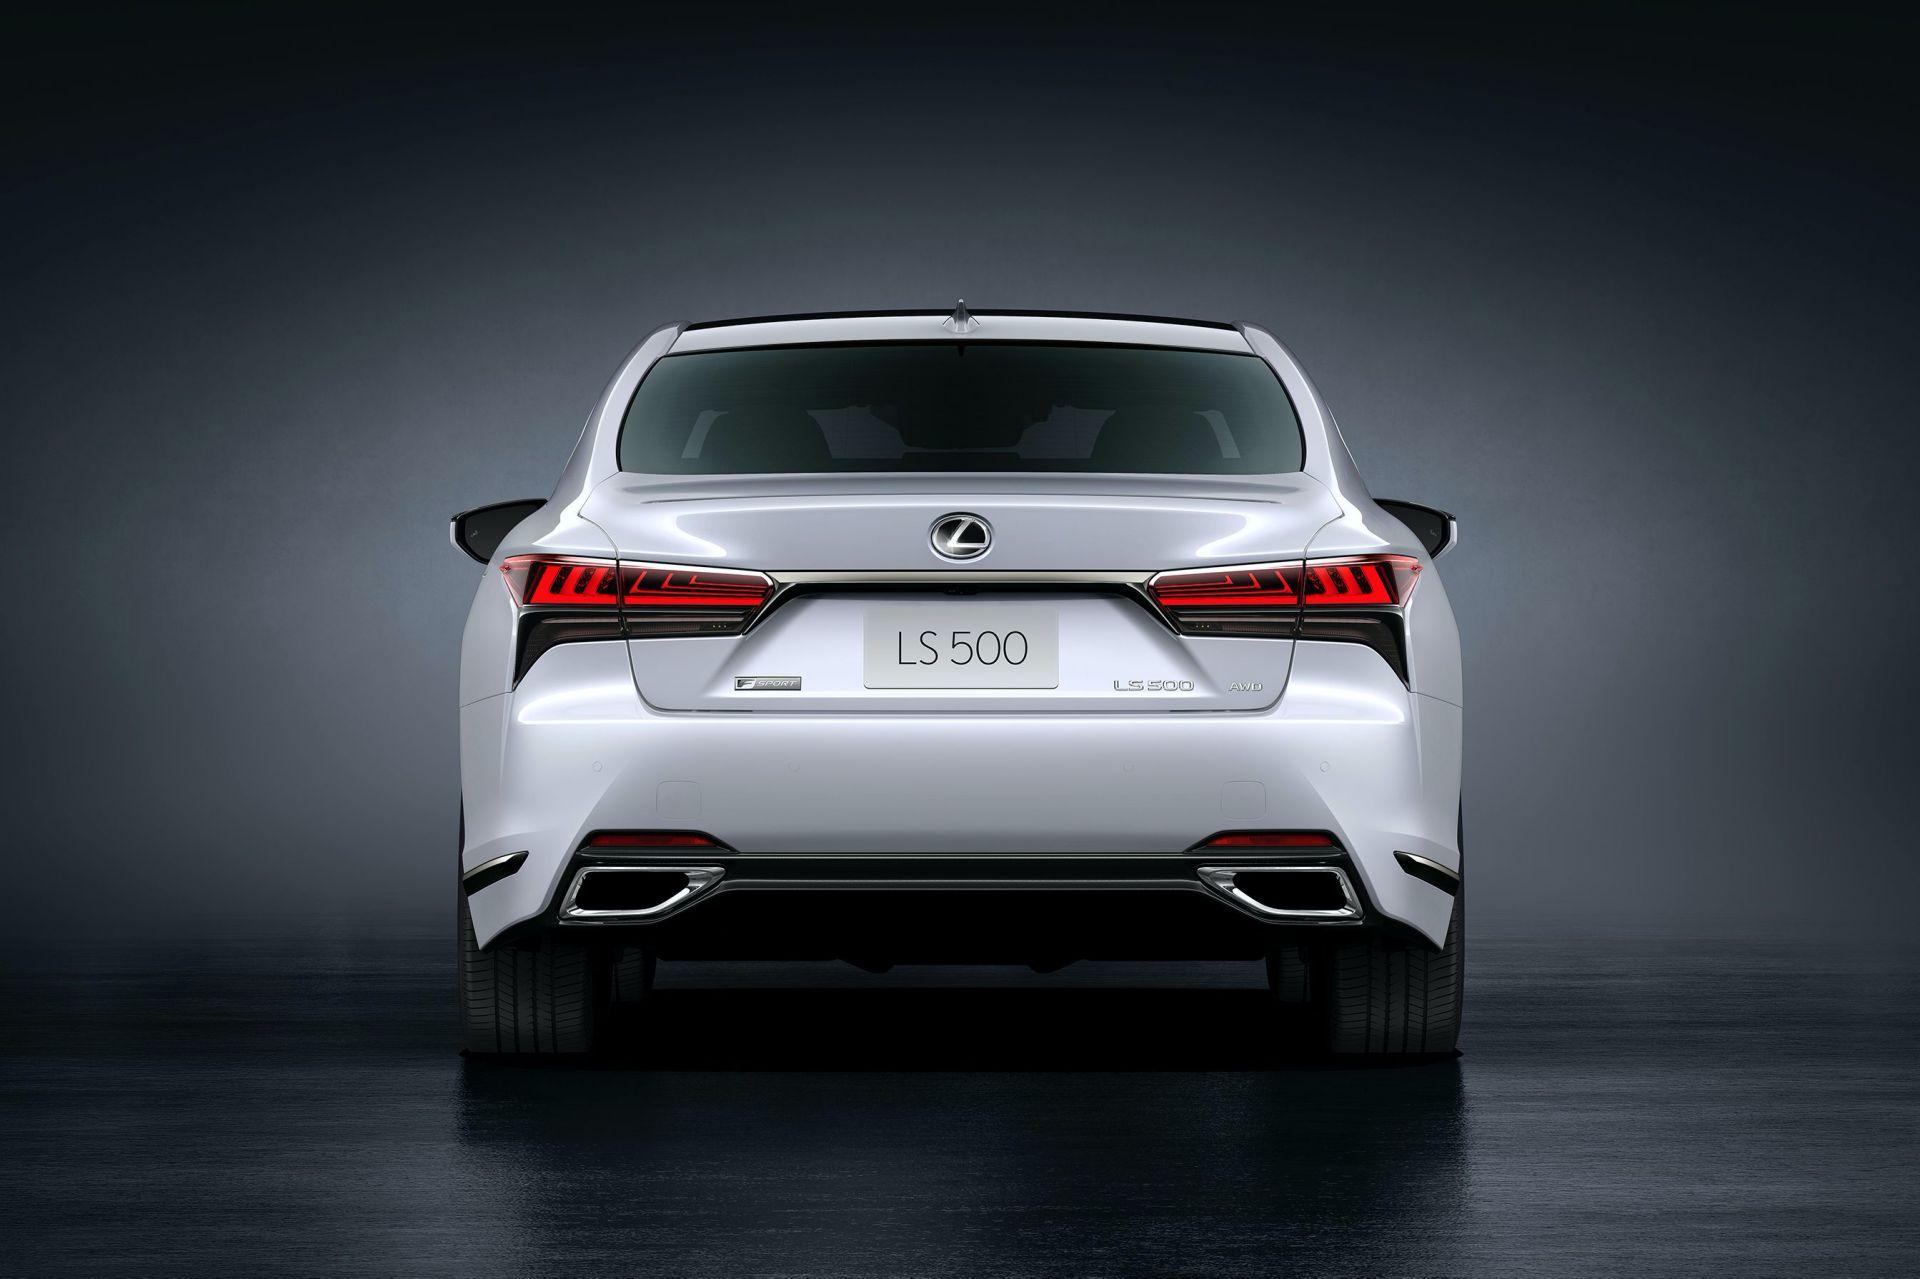 2021-lexus-ls-facelift-6.jpg